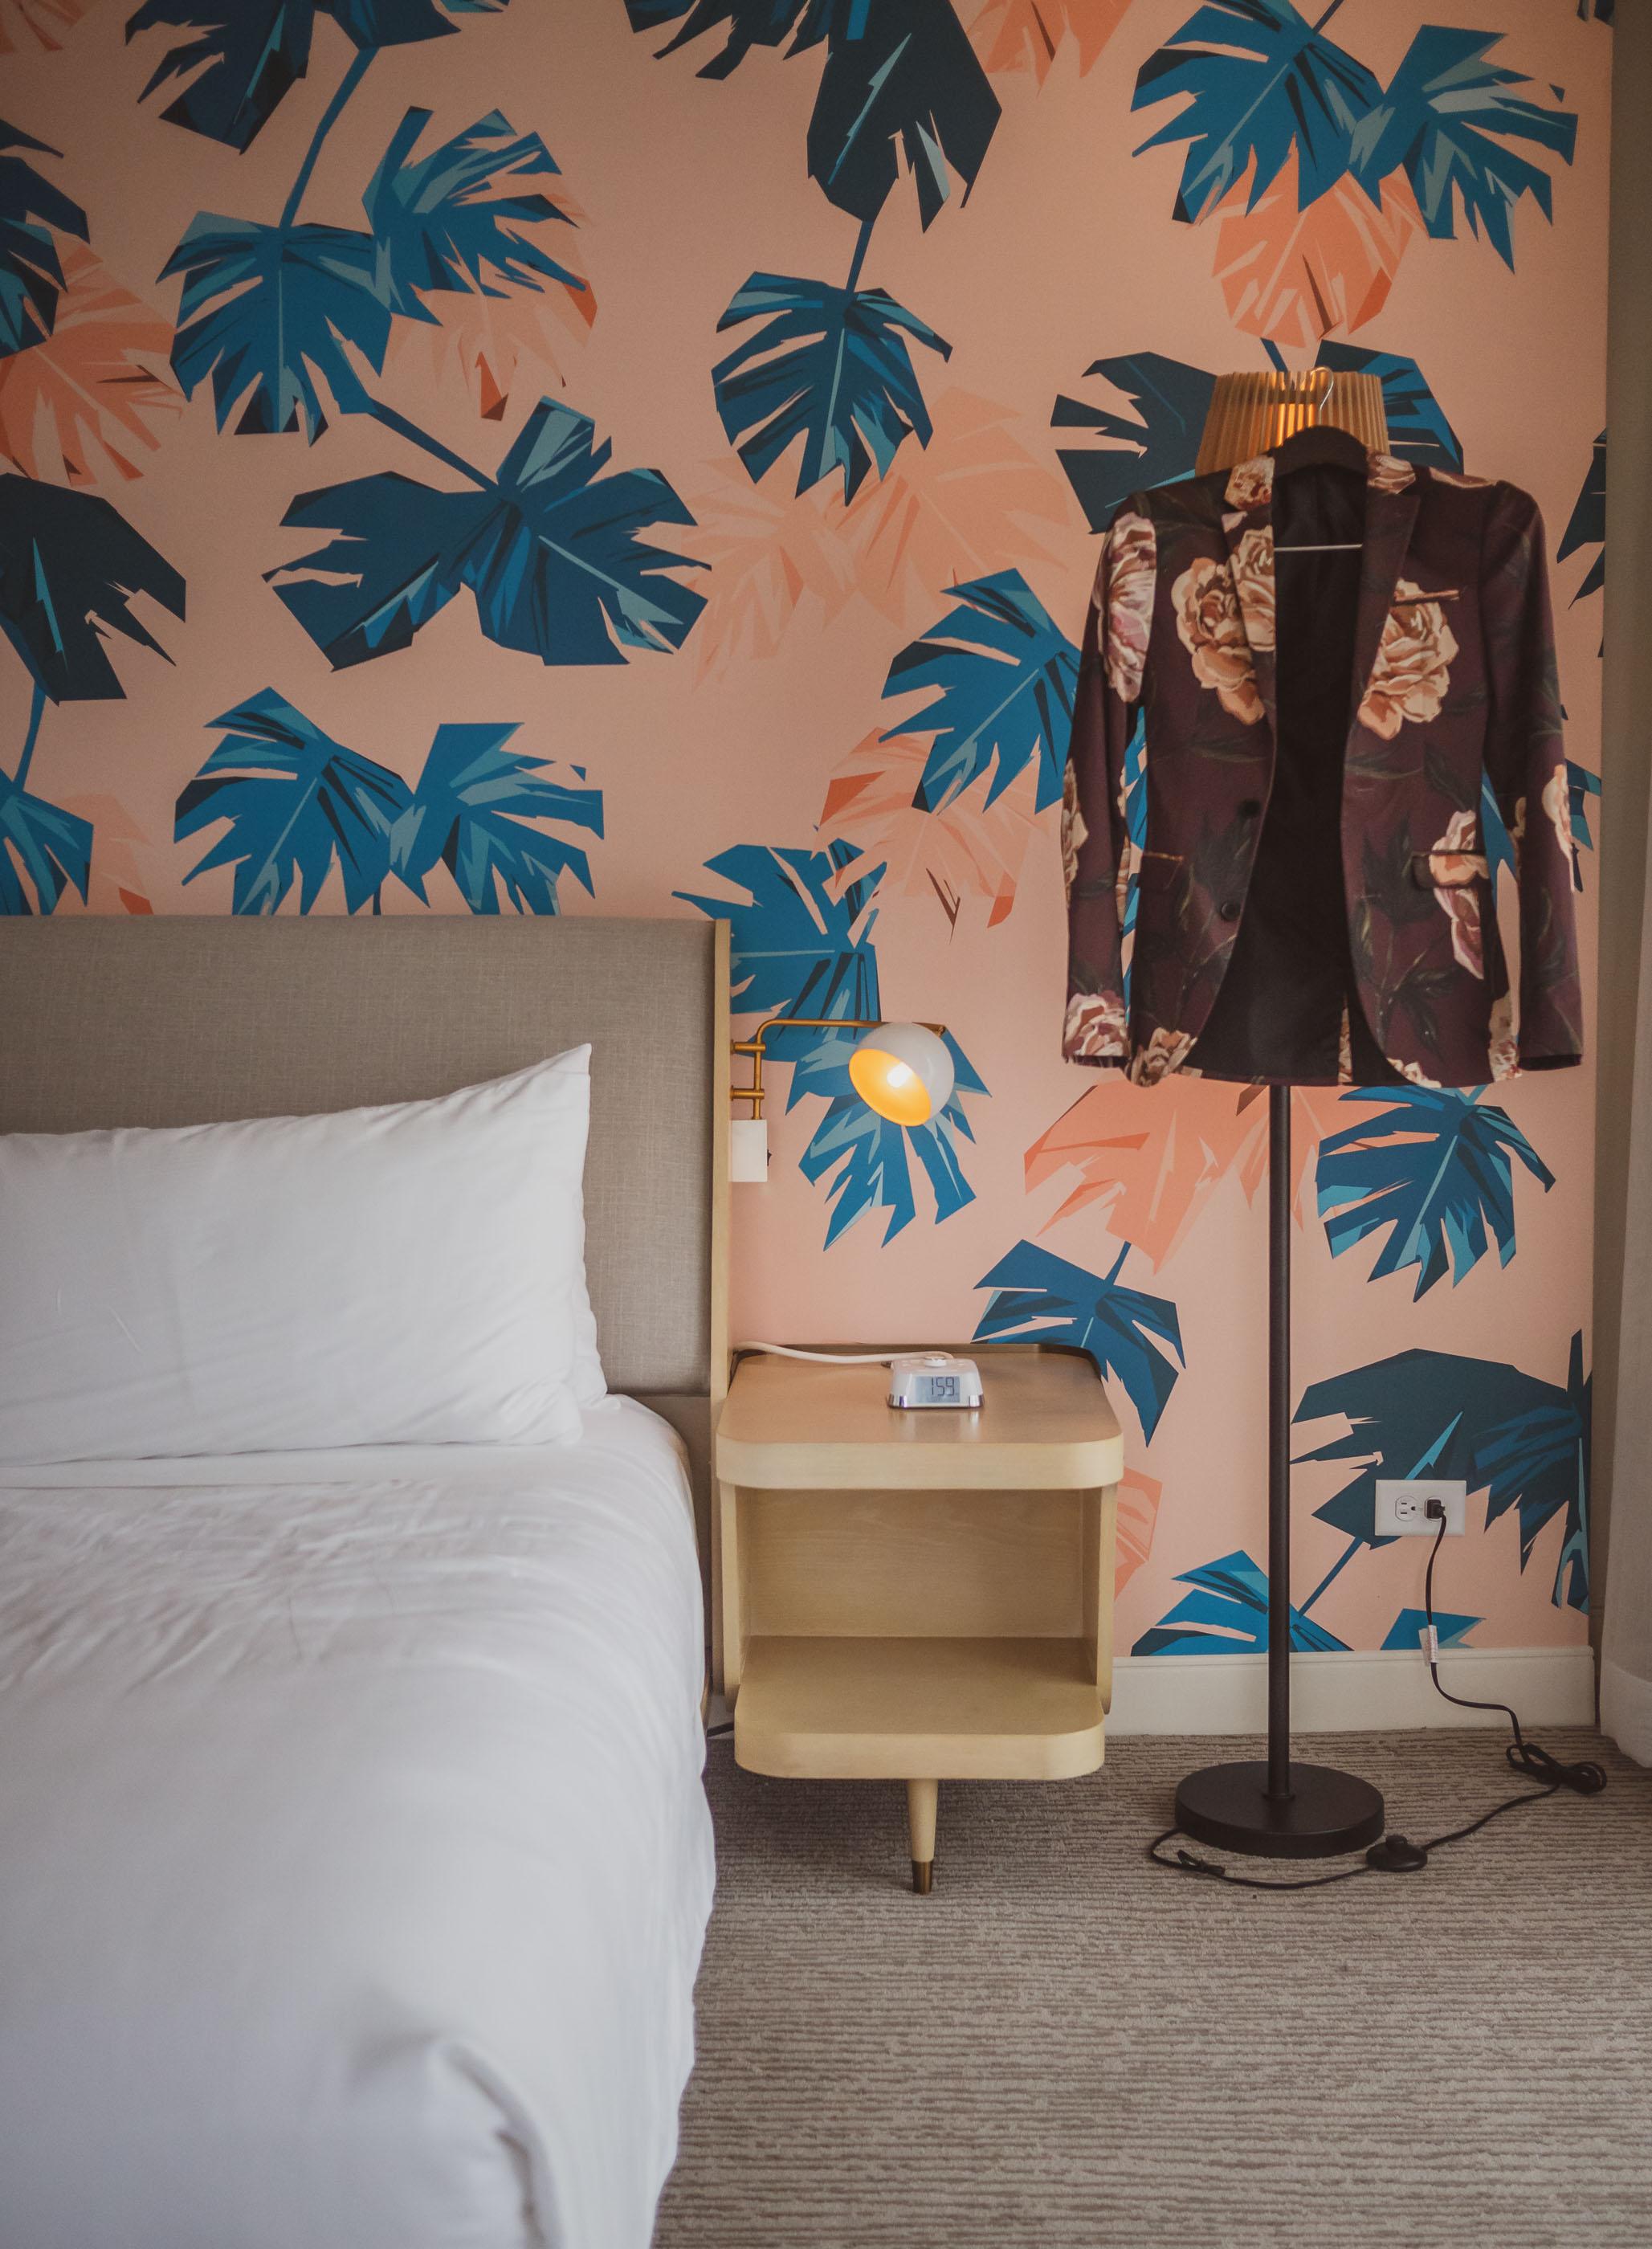 MYBELONGING-TOMMY-LEI-THE-LAYLOW-WAIKIKI-HOTEL-12.jpg